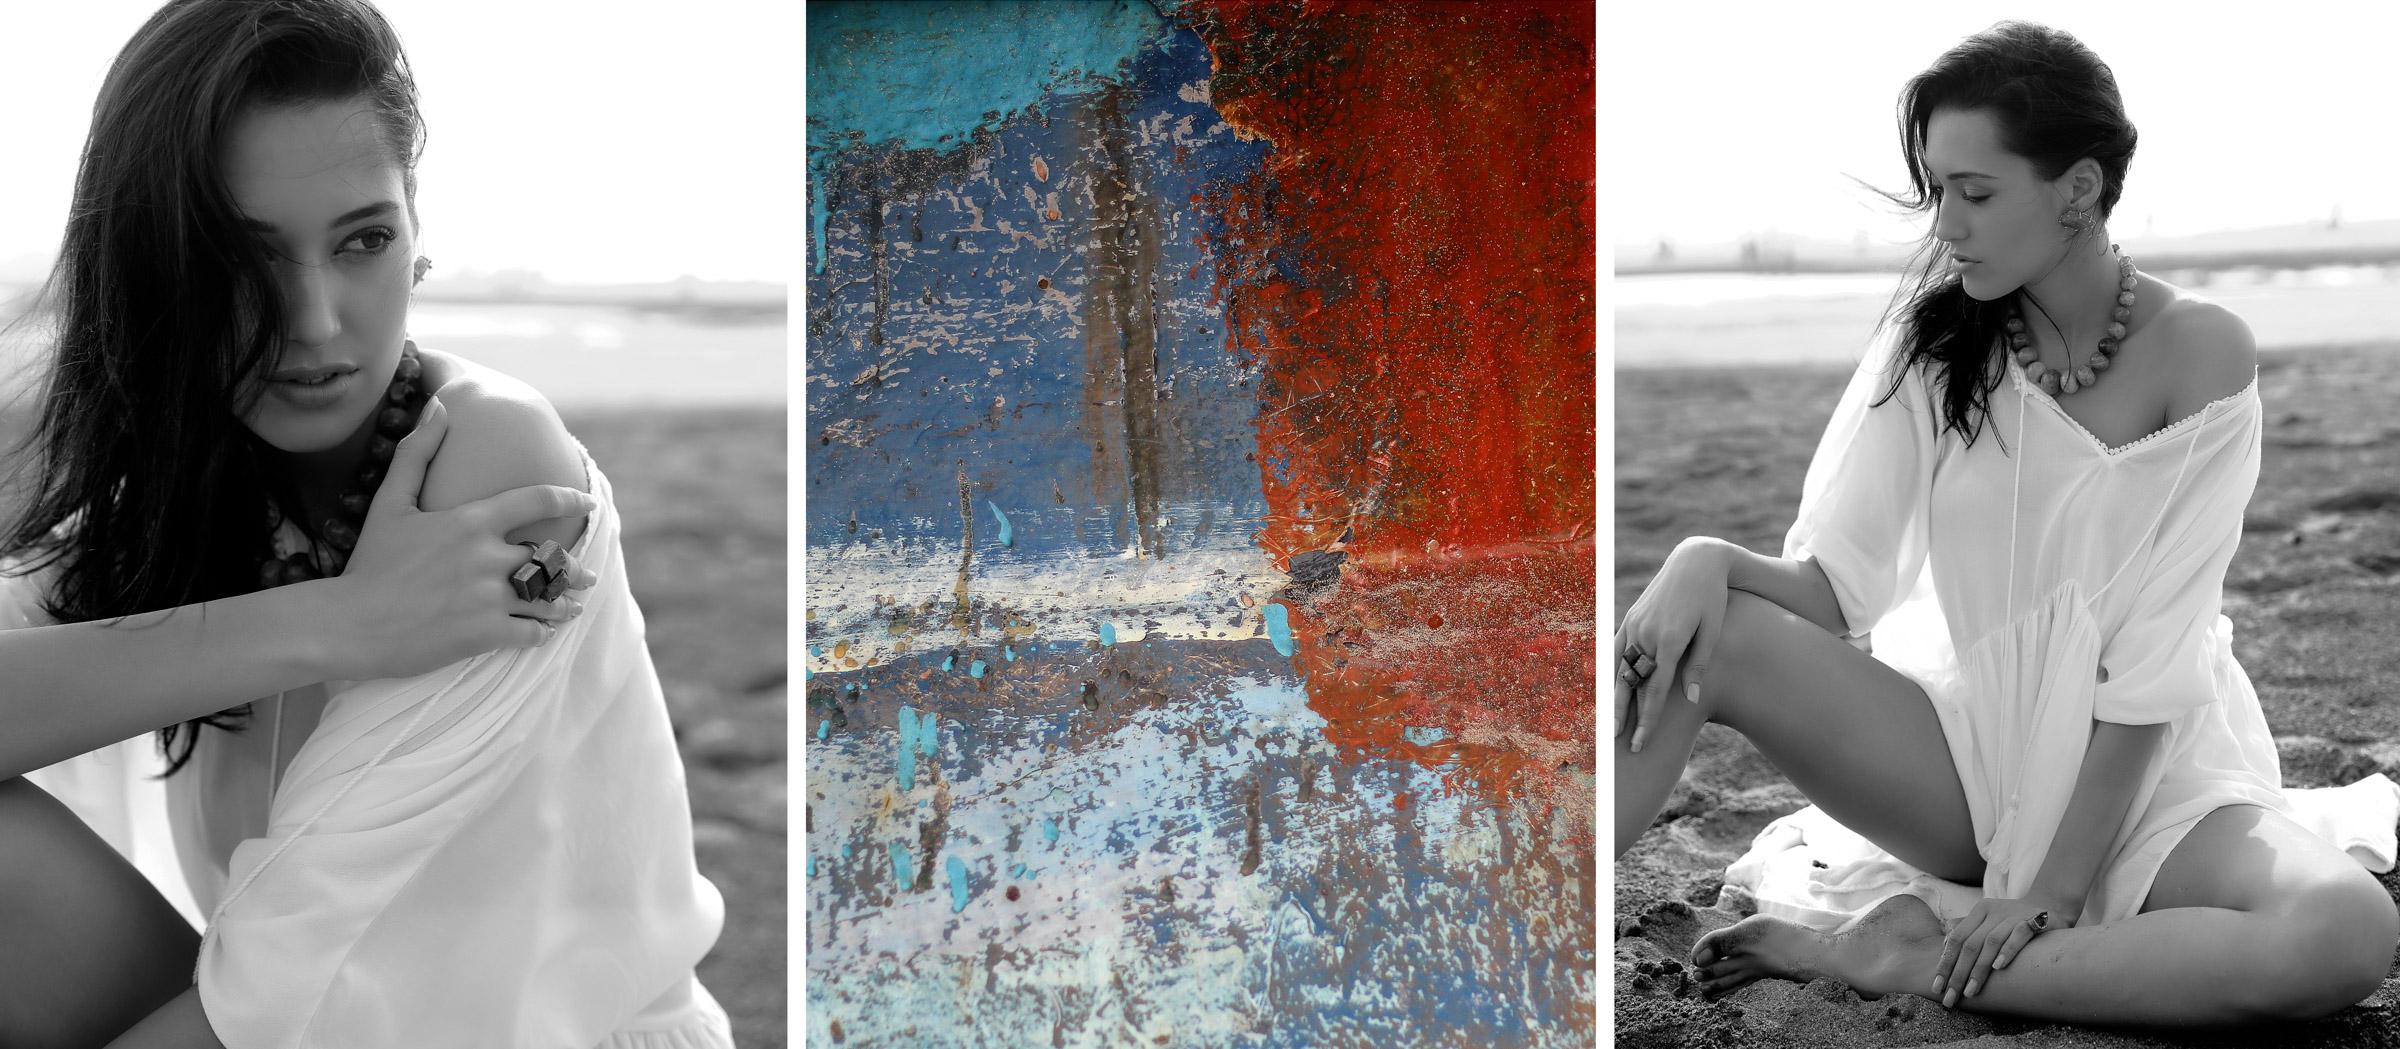 Kriator-Photographer-Vanitas_03.jpg